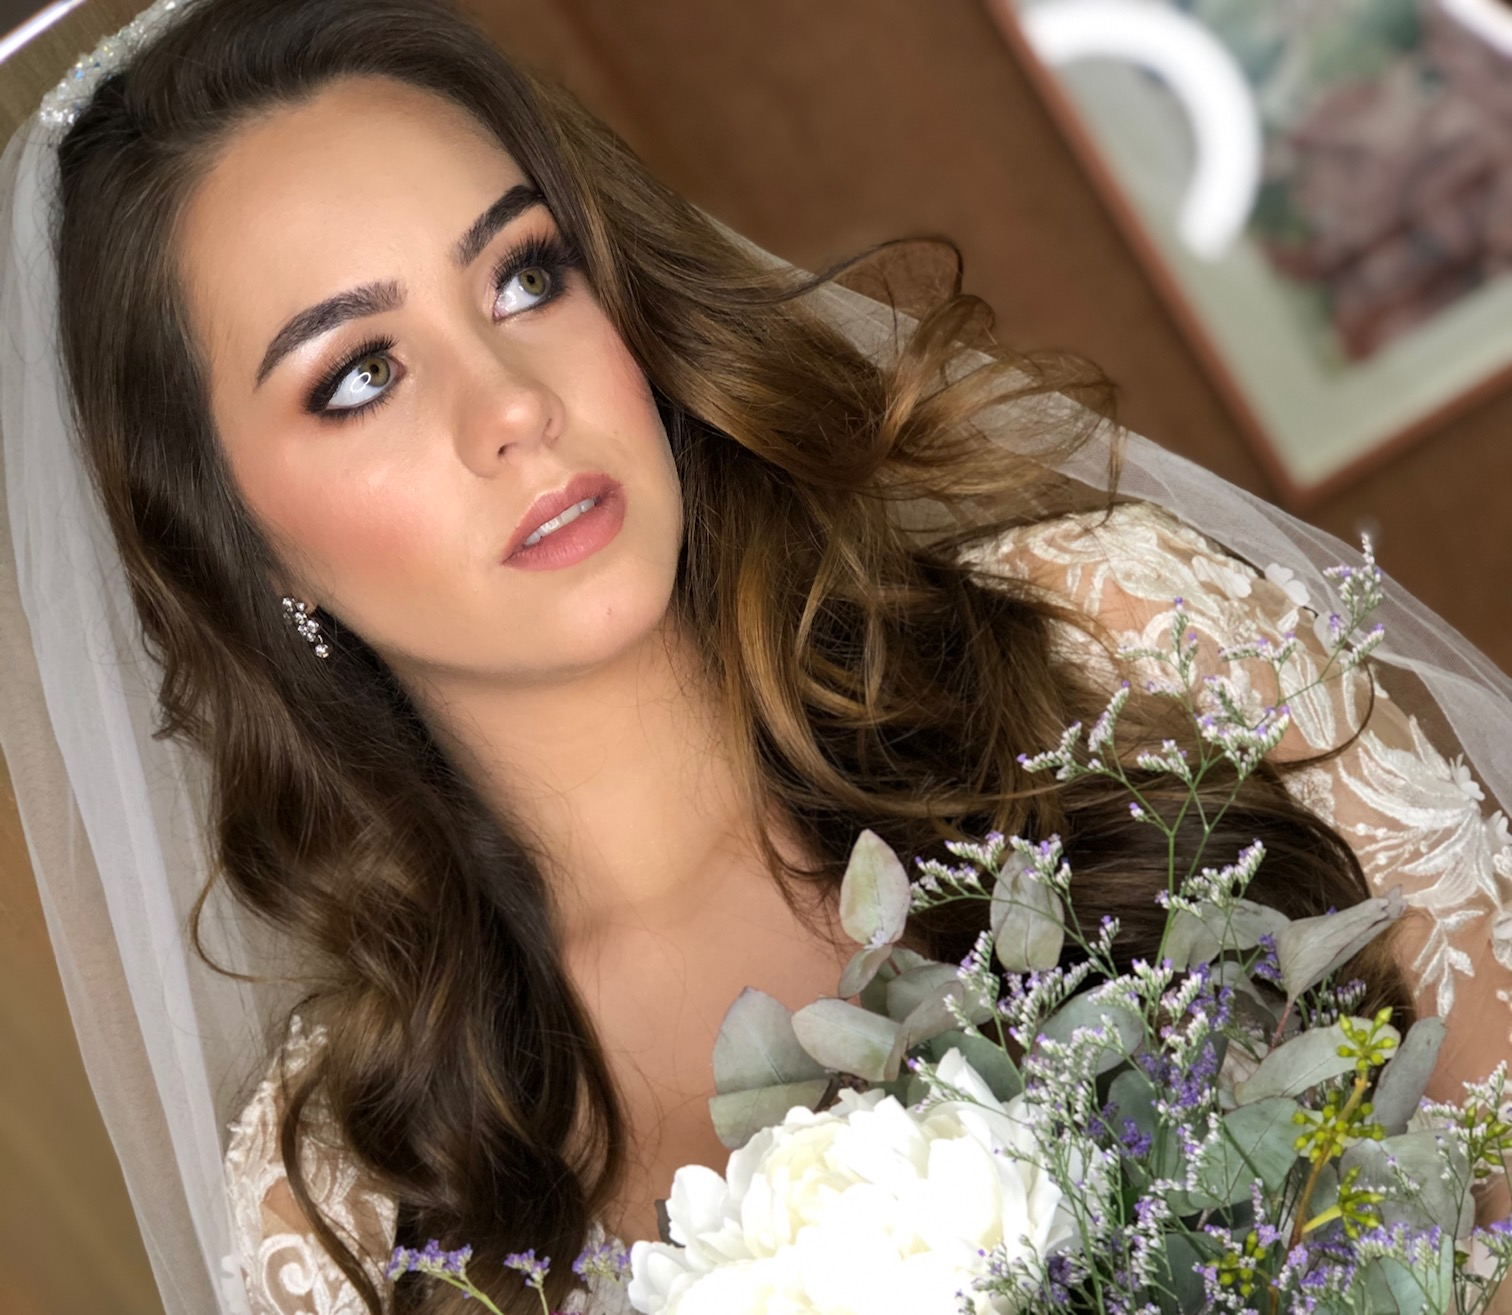 dia de noiva santo andré